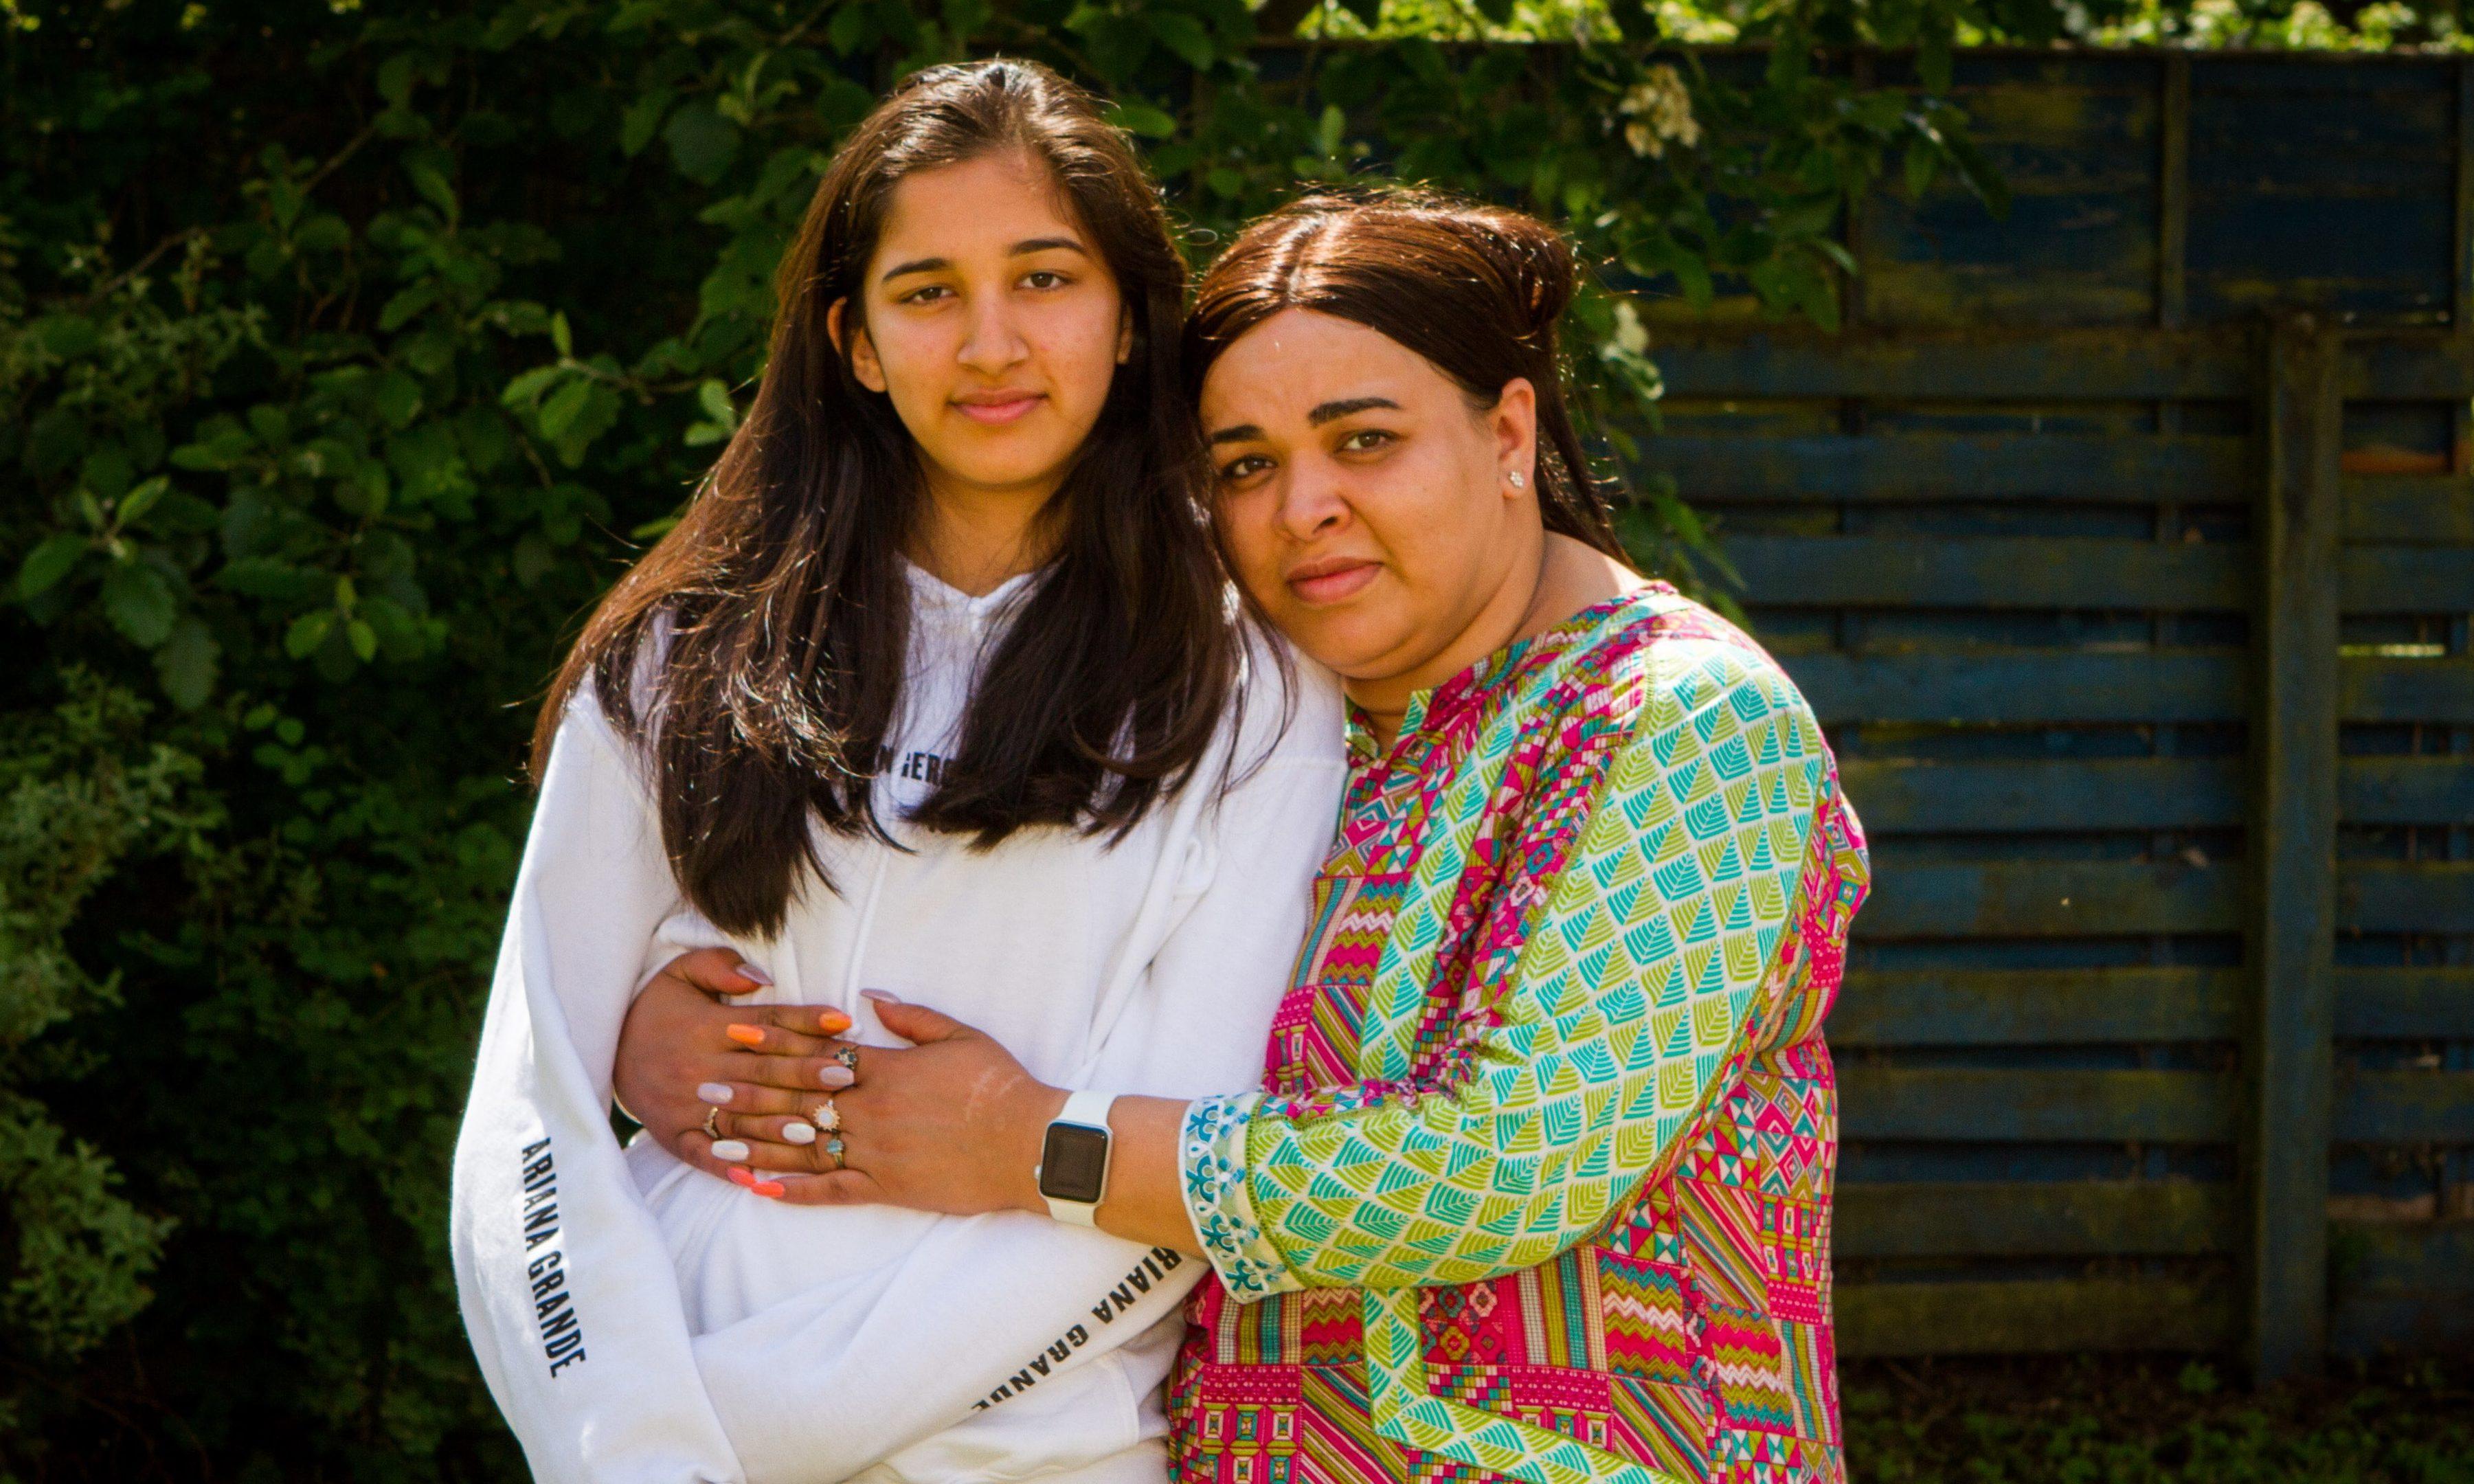 Saima Shah with daughter Muminah (Mona) Shah, 14.